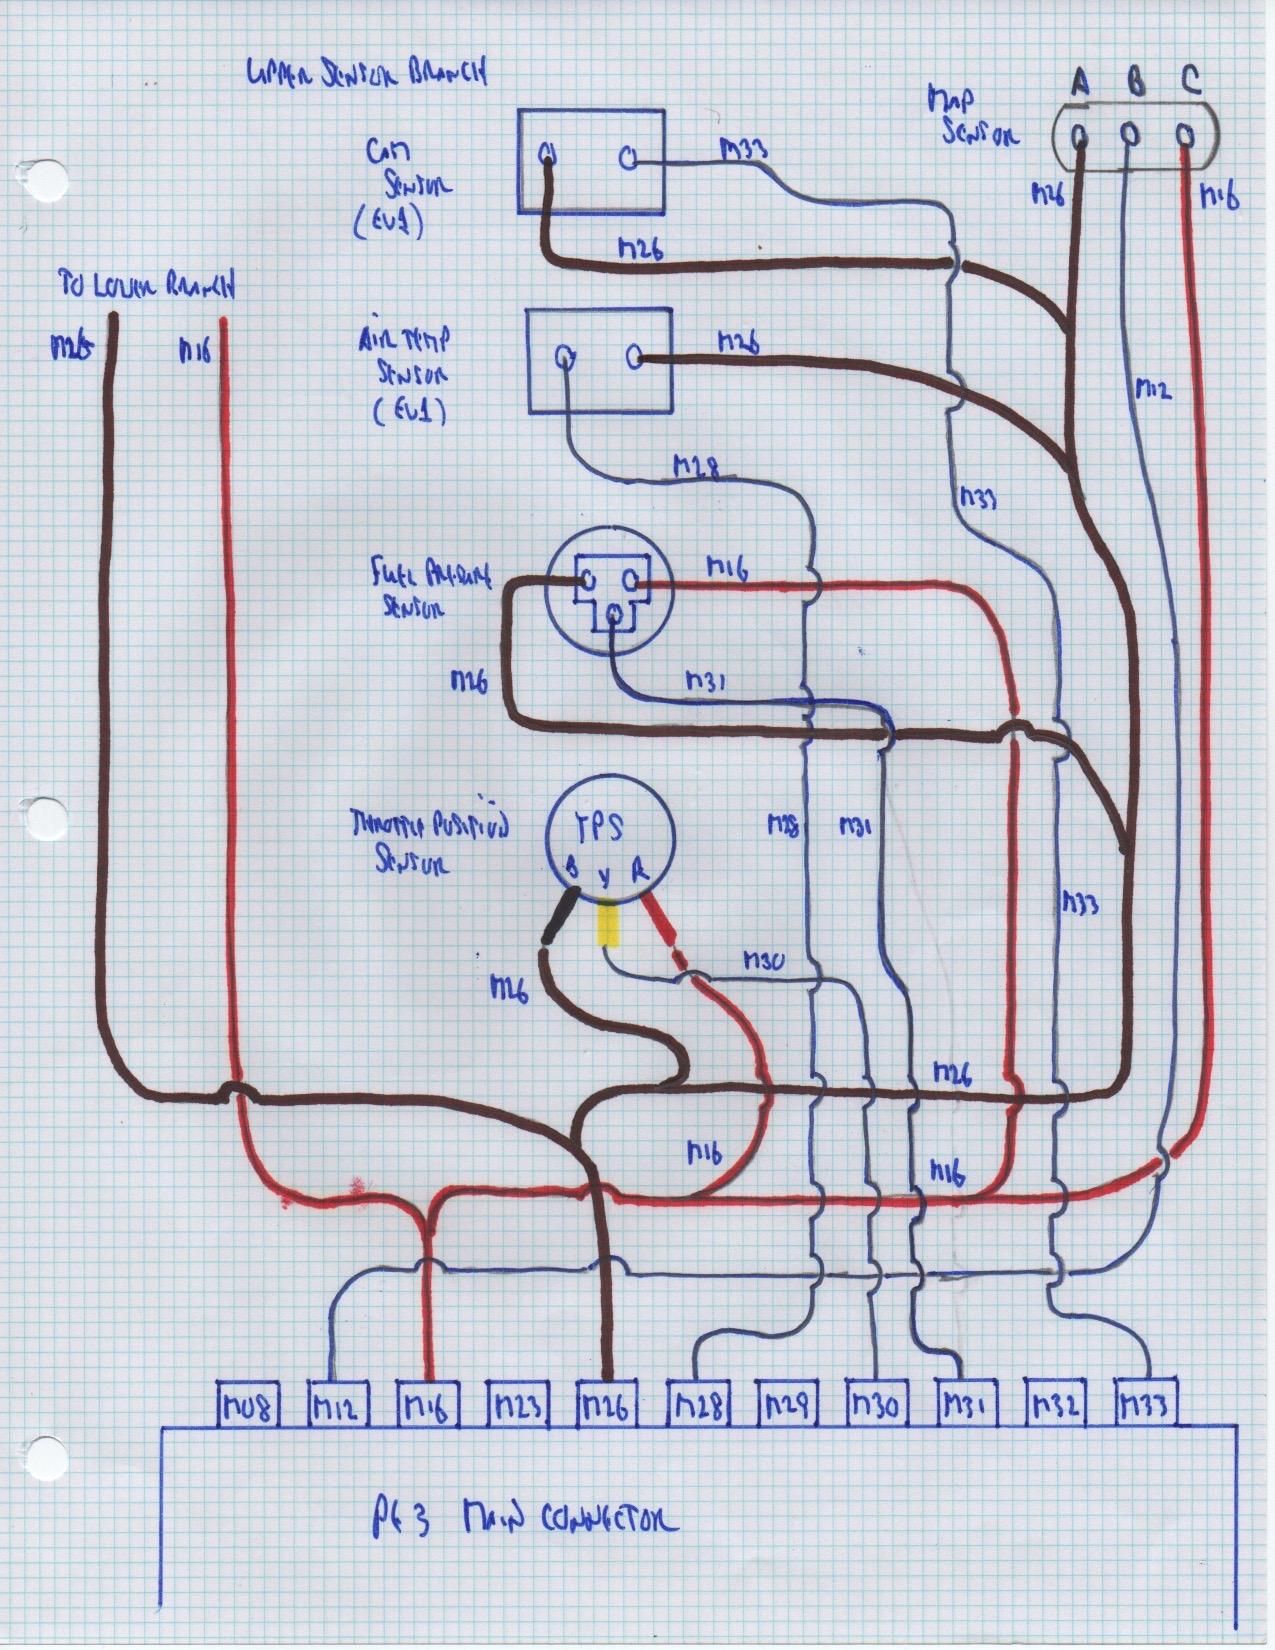 Upper Sensor Branch Wiring Diagram  U2013 Junk Yard Zetec